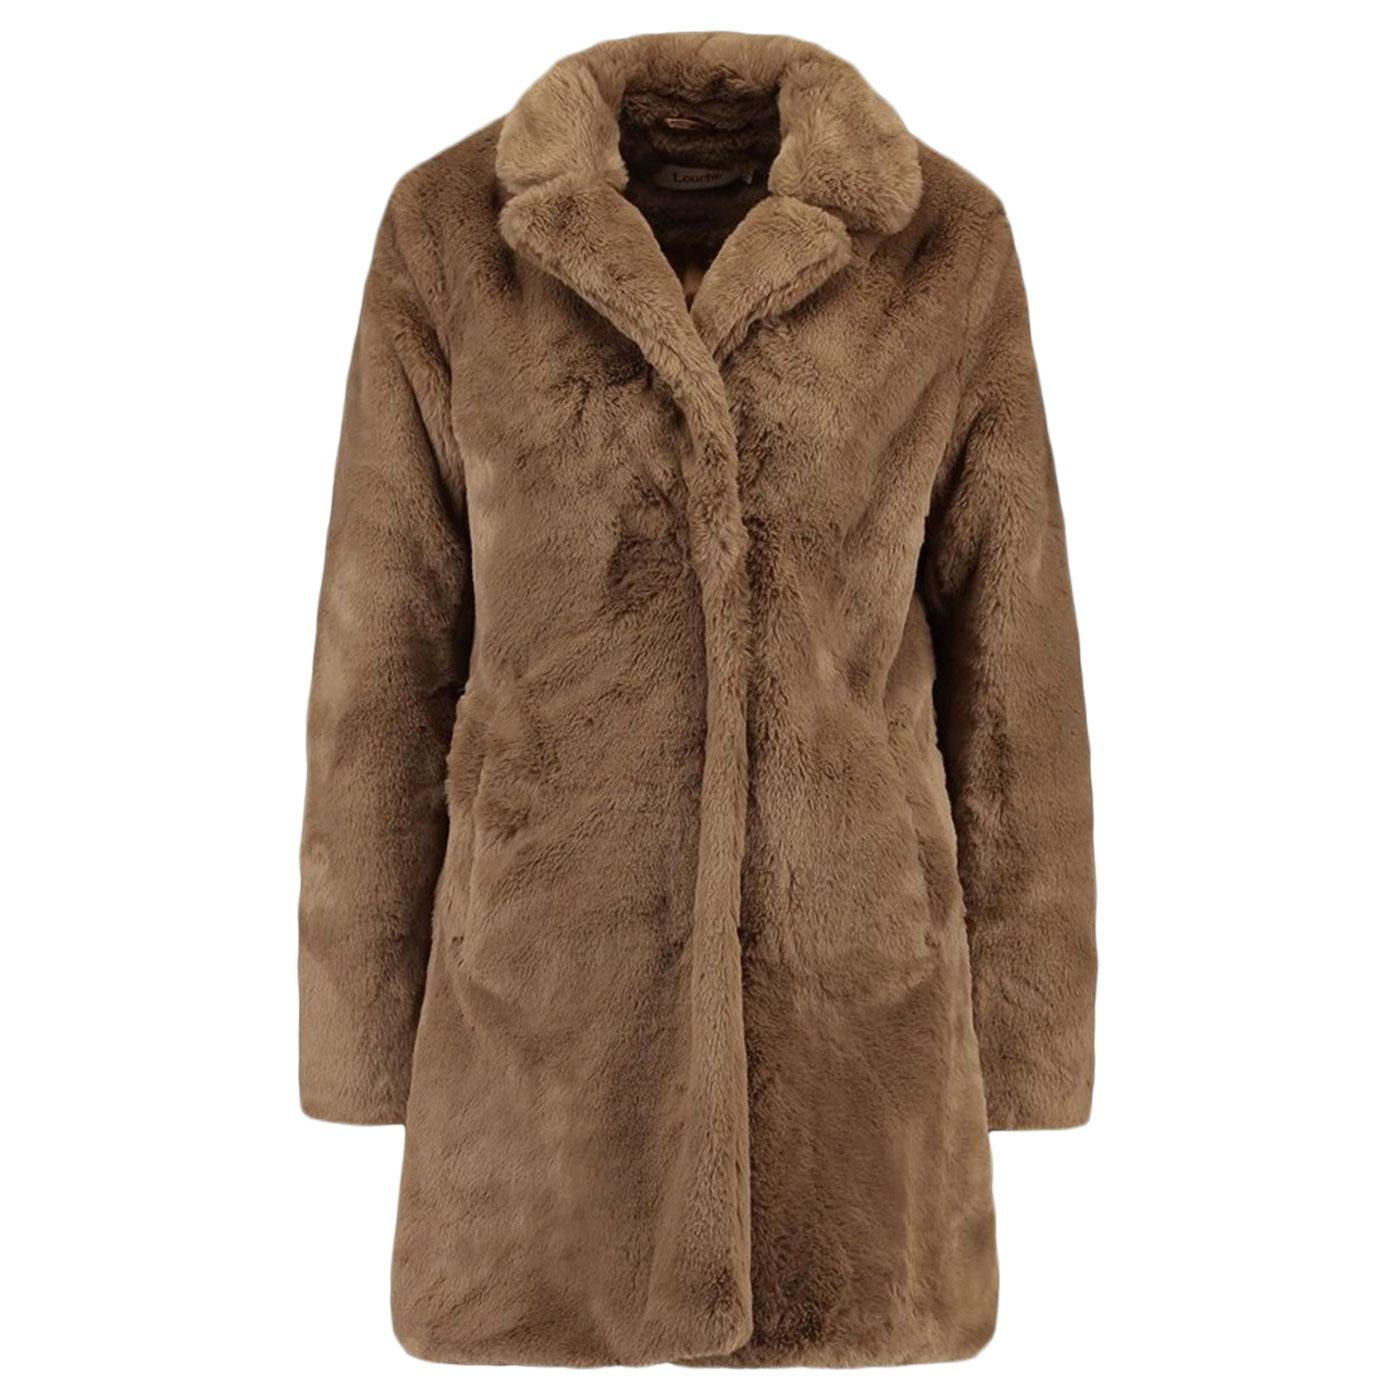 Wainwright LOUCHE Vintage Faux Fur Coat Brown